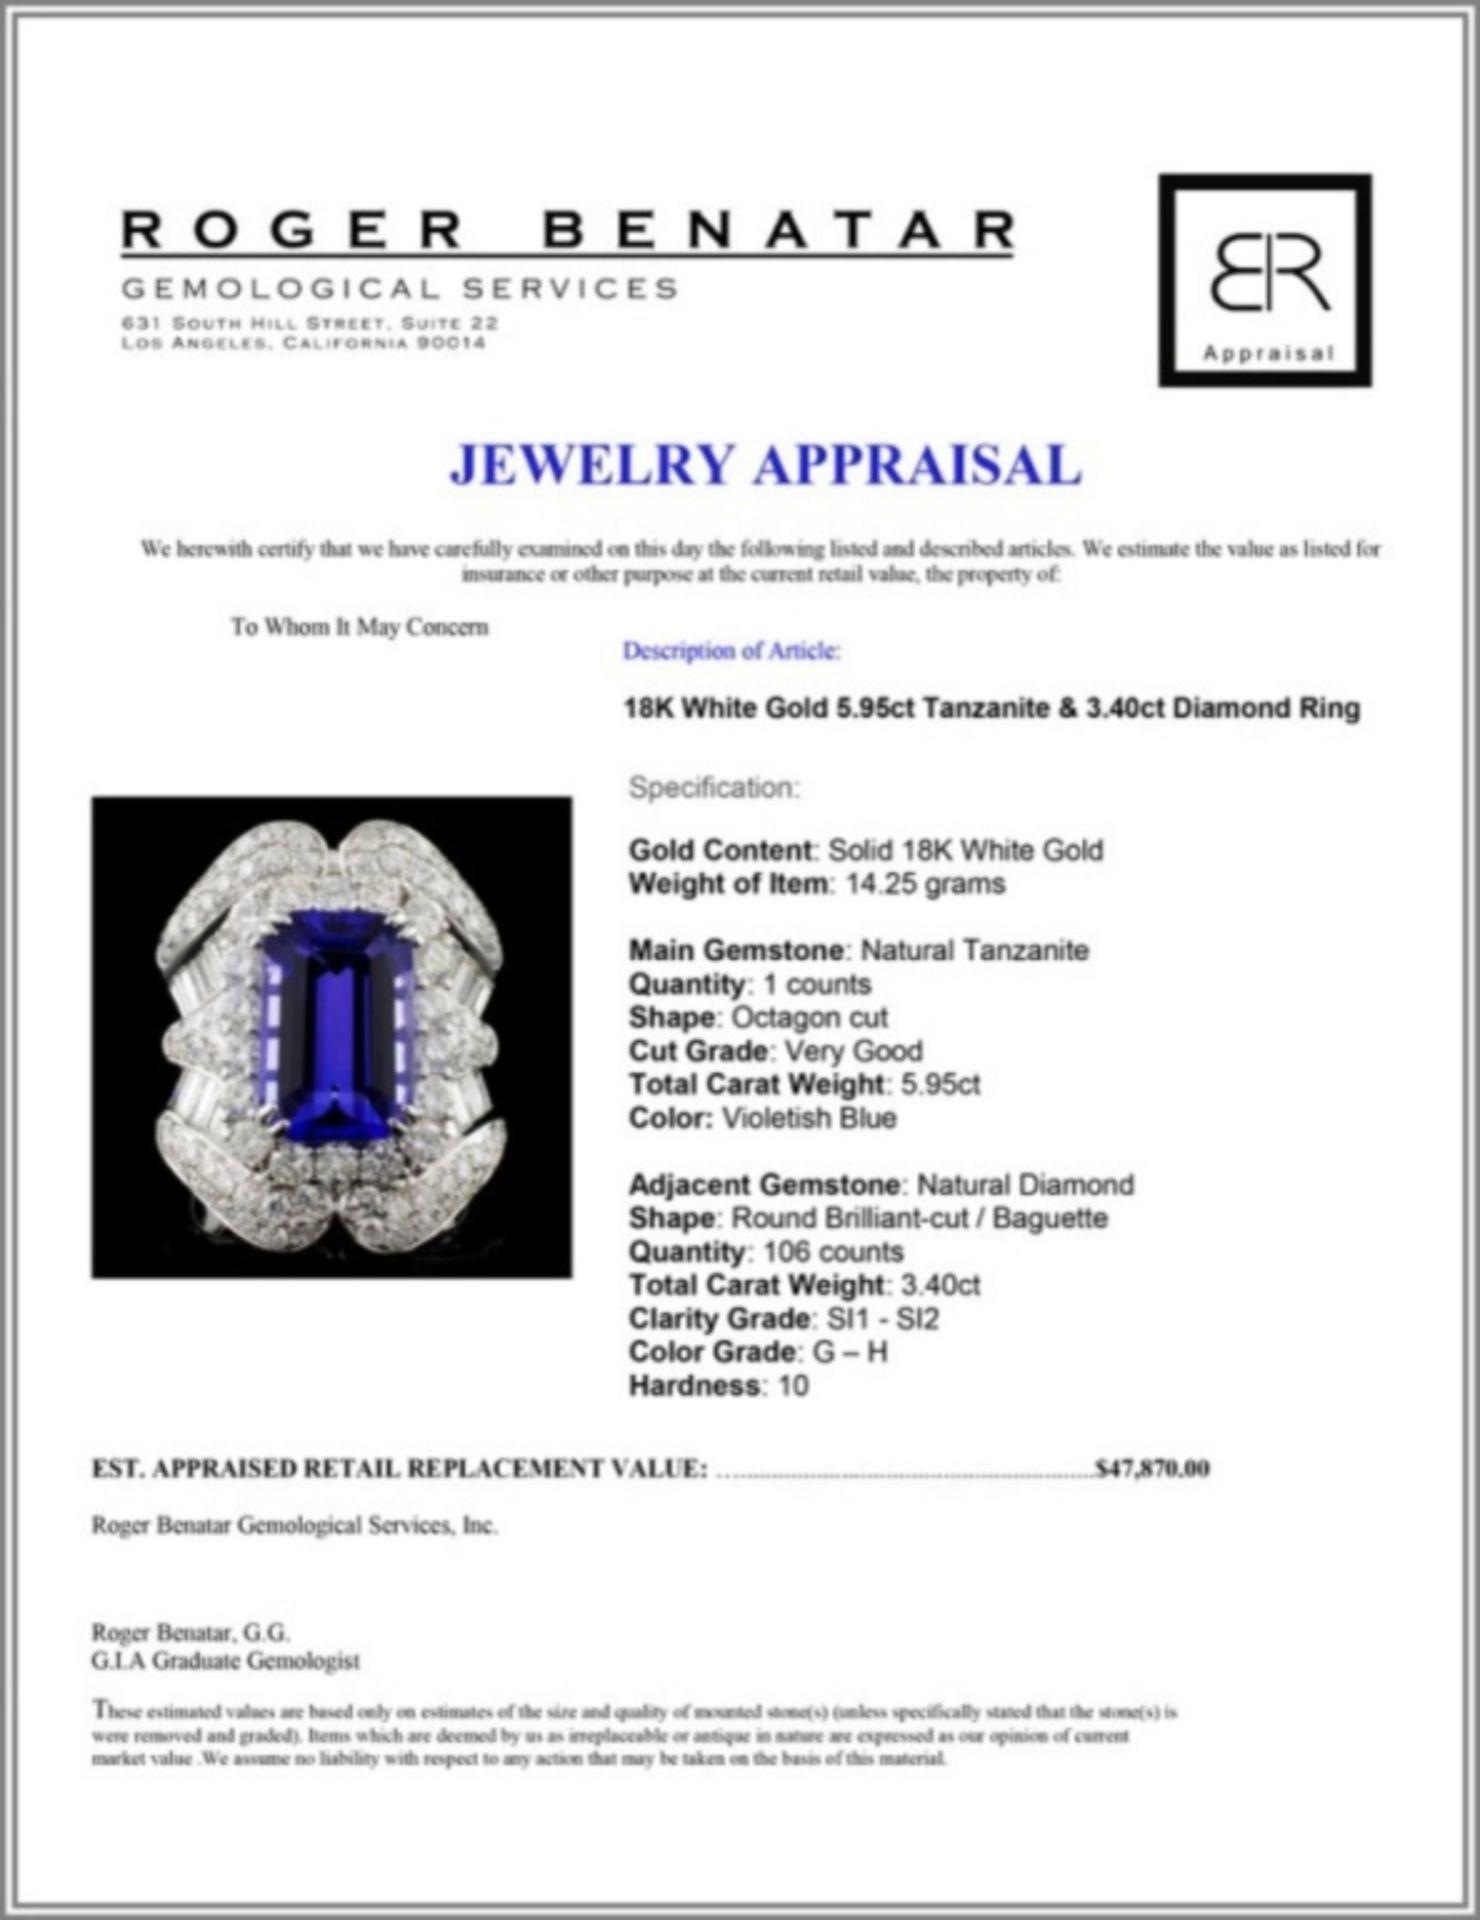 18K White Gold 5.95ct Tanzanite & 3.40ct Diamond R - Image 4 of 4